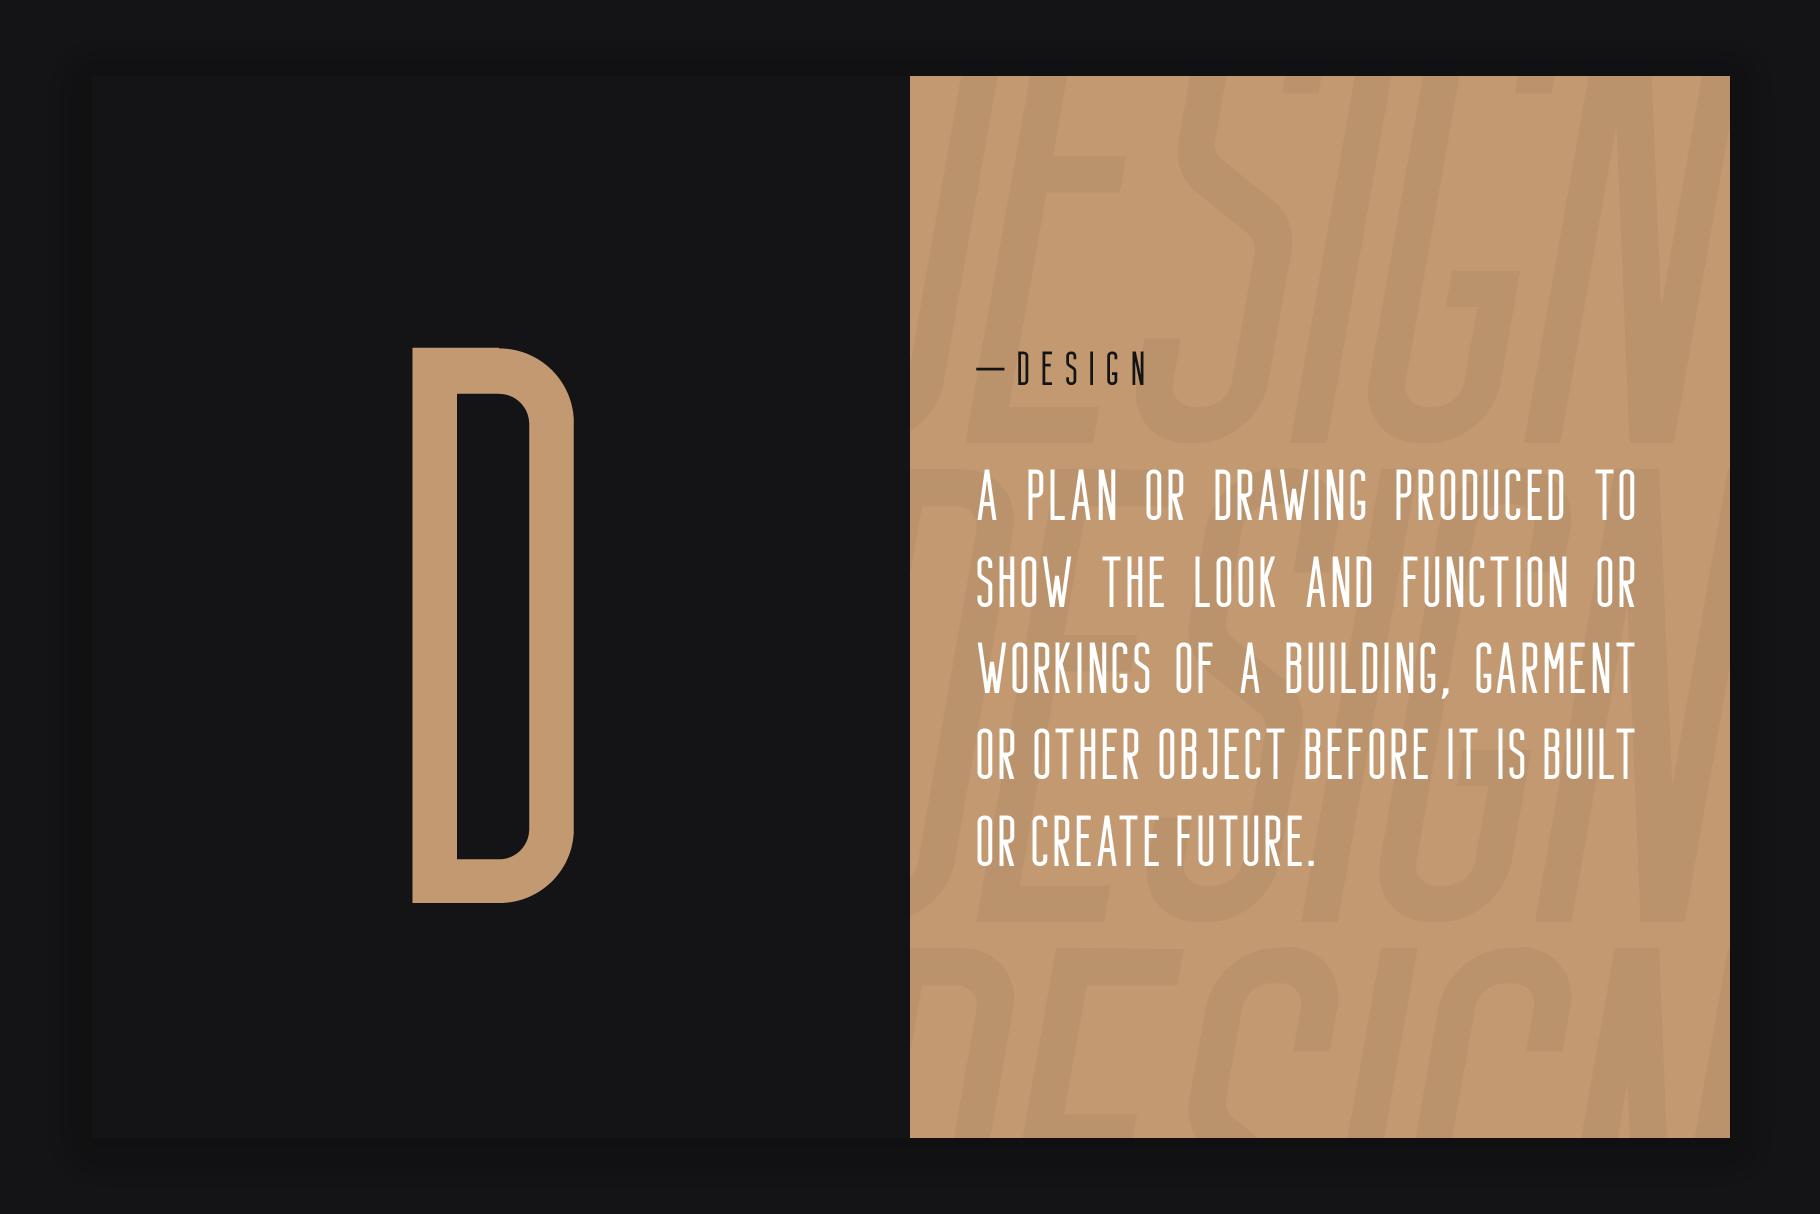 Bondie - Condensed Sans Serif example image 3